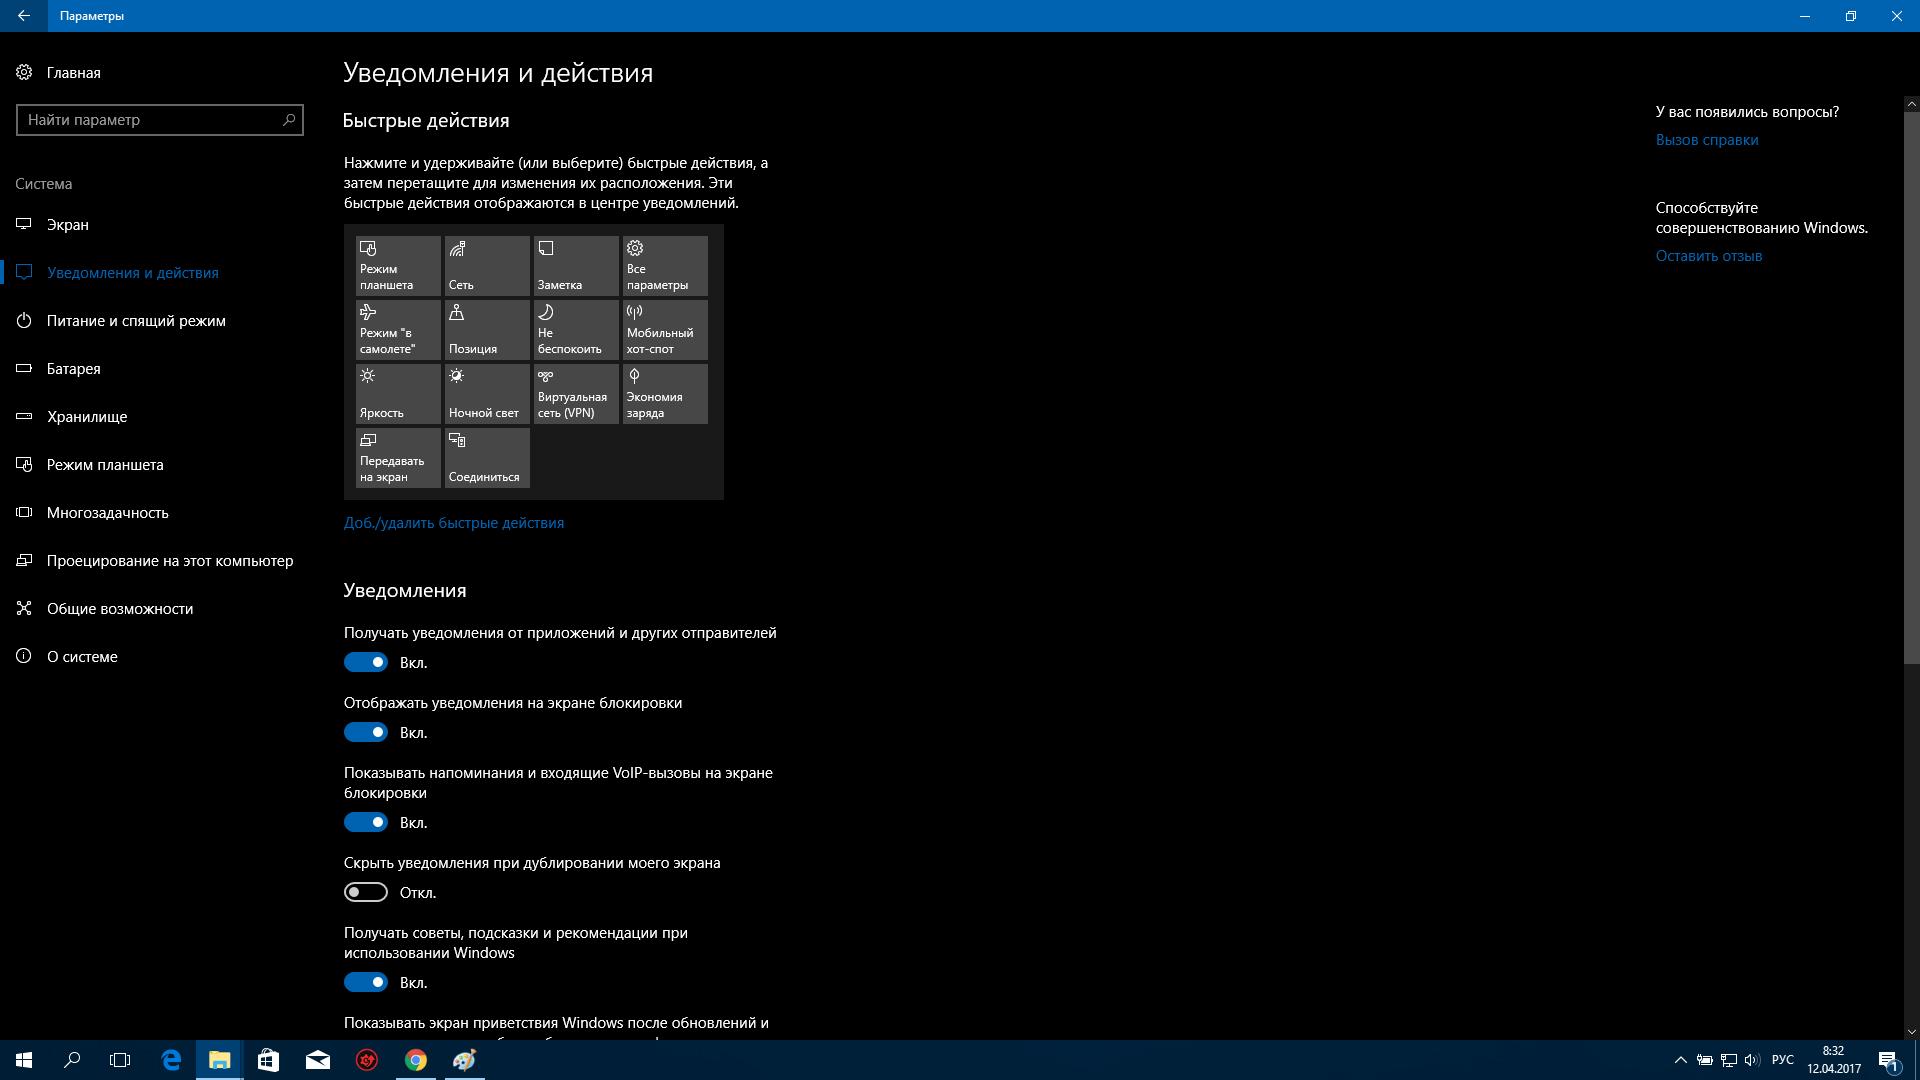 Возможности Windows 10 4